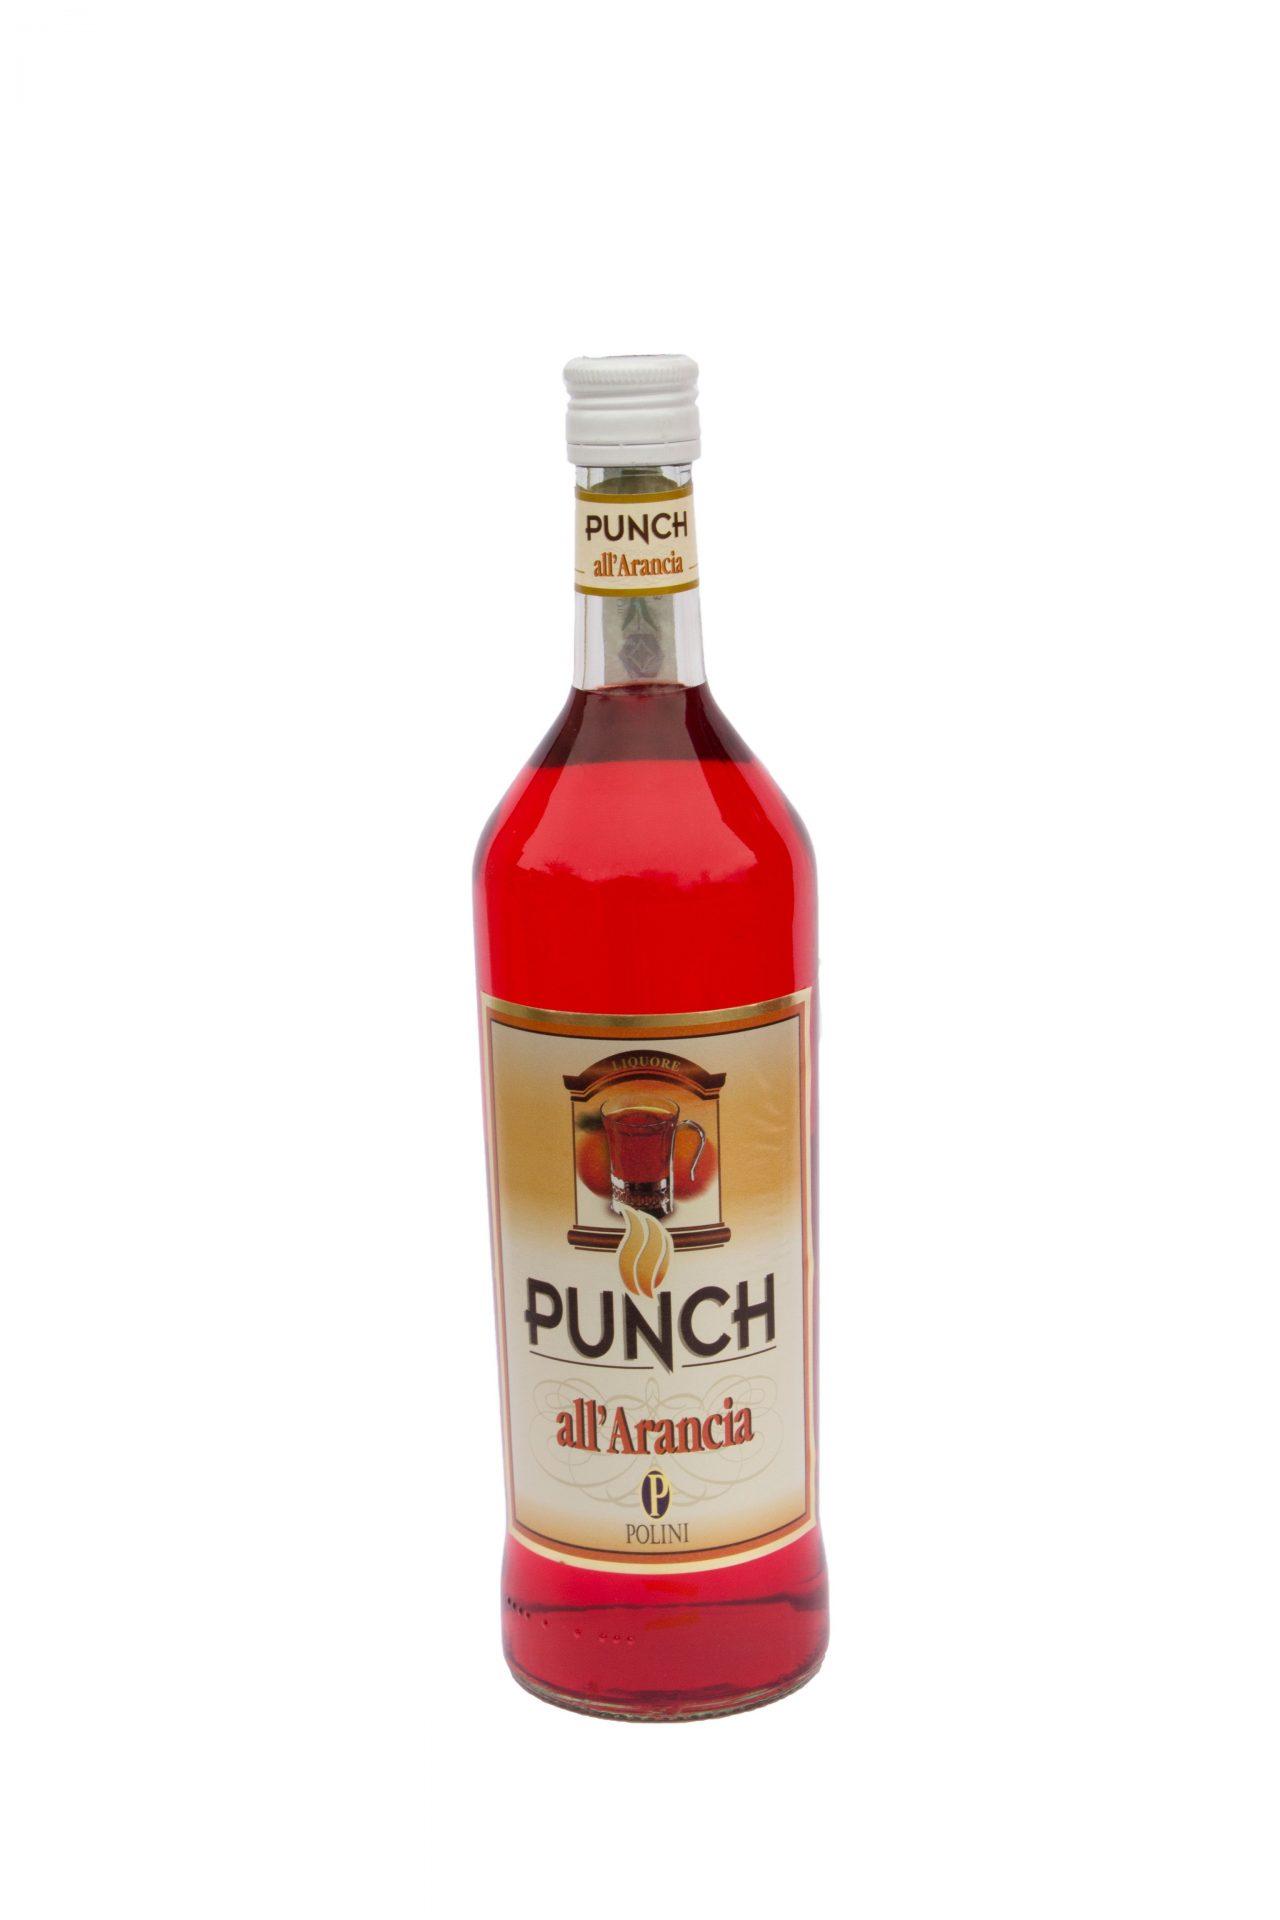 Polini – Punch Arancio